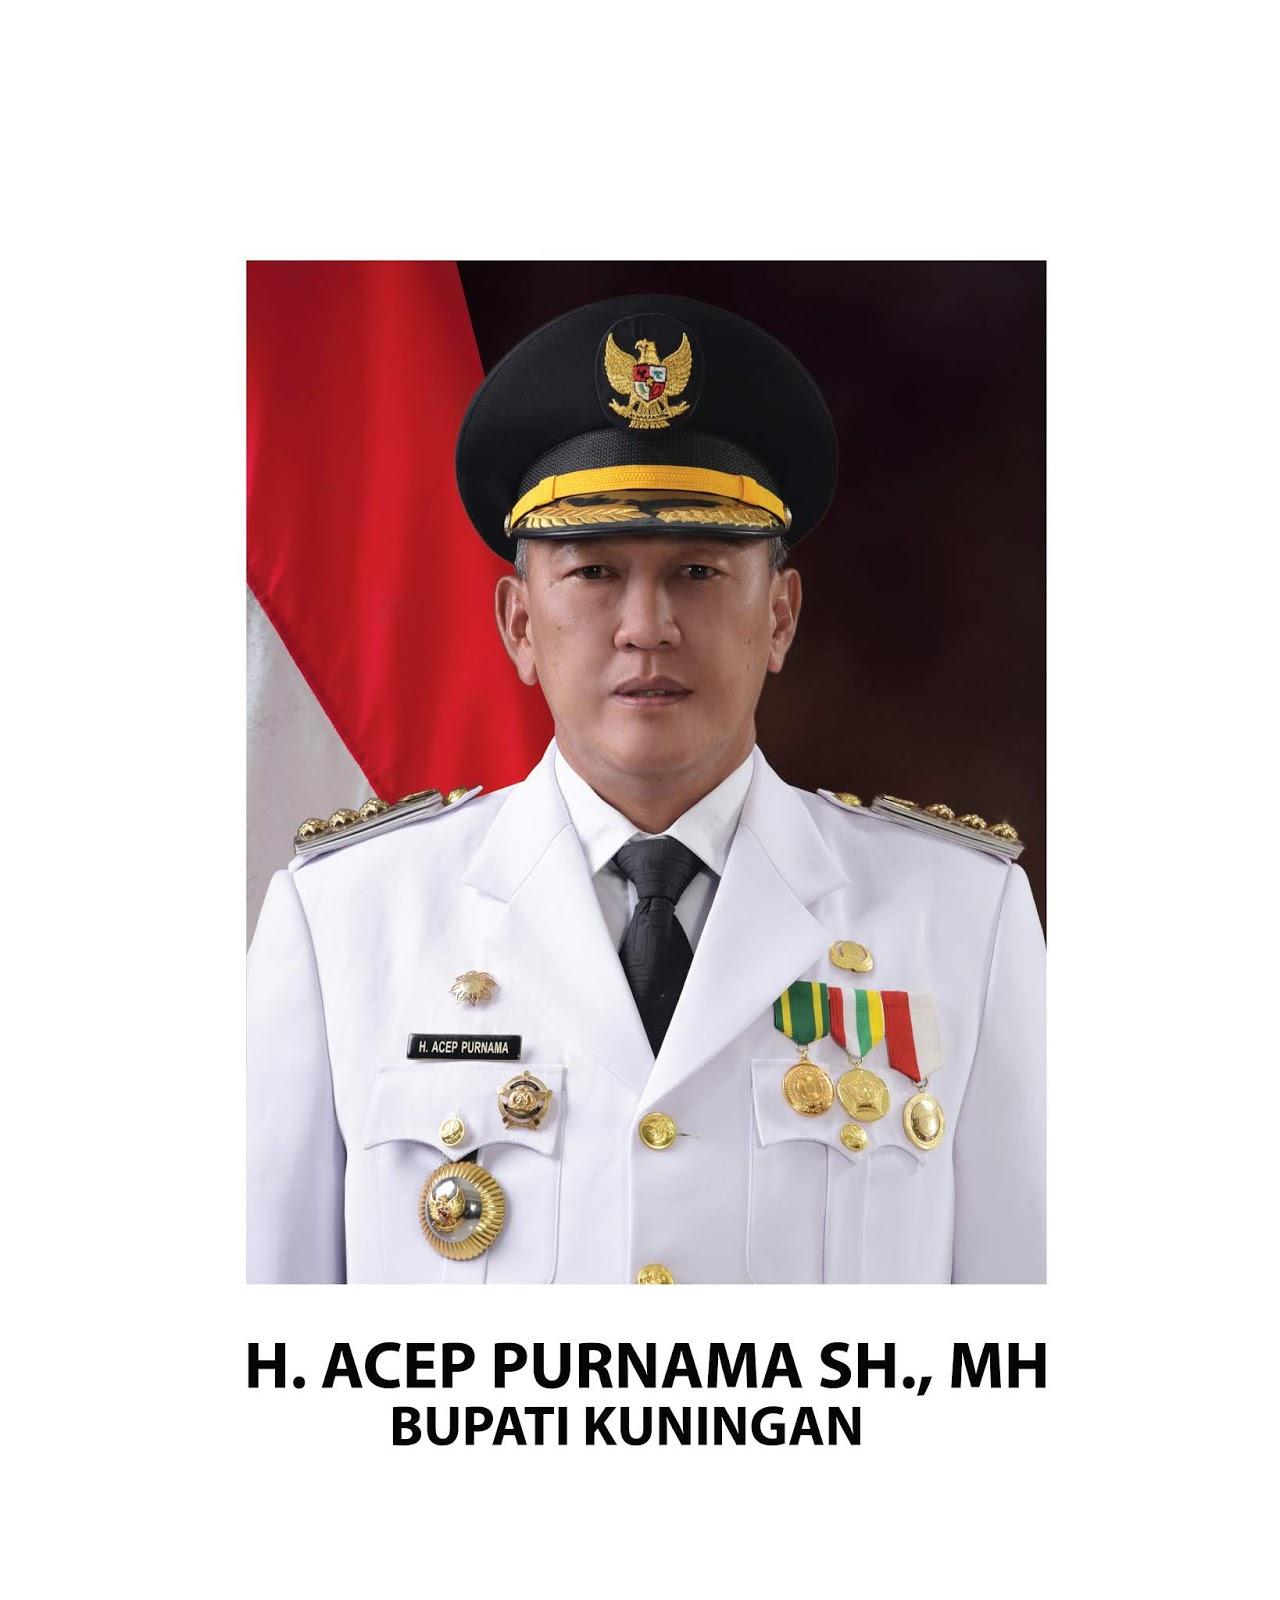 Bupati Kuningan Acep Purnama 2018 - 2023